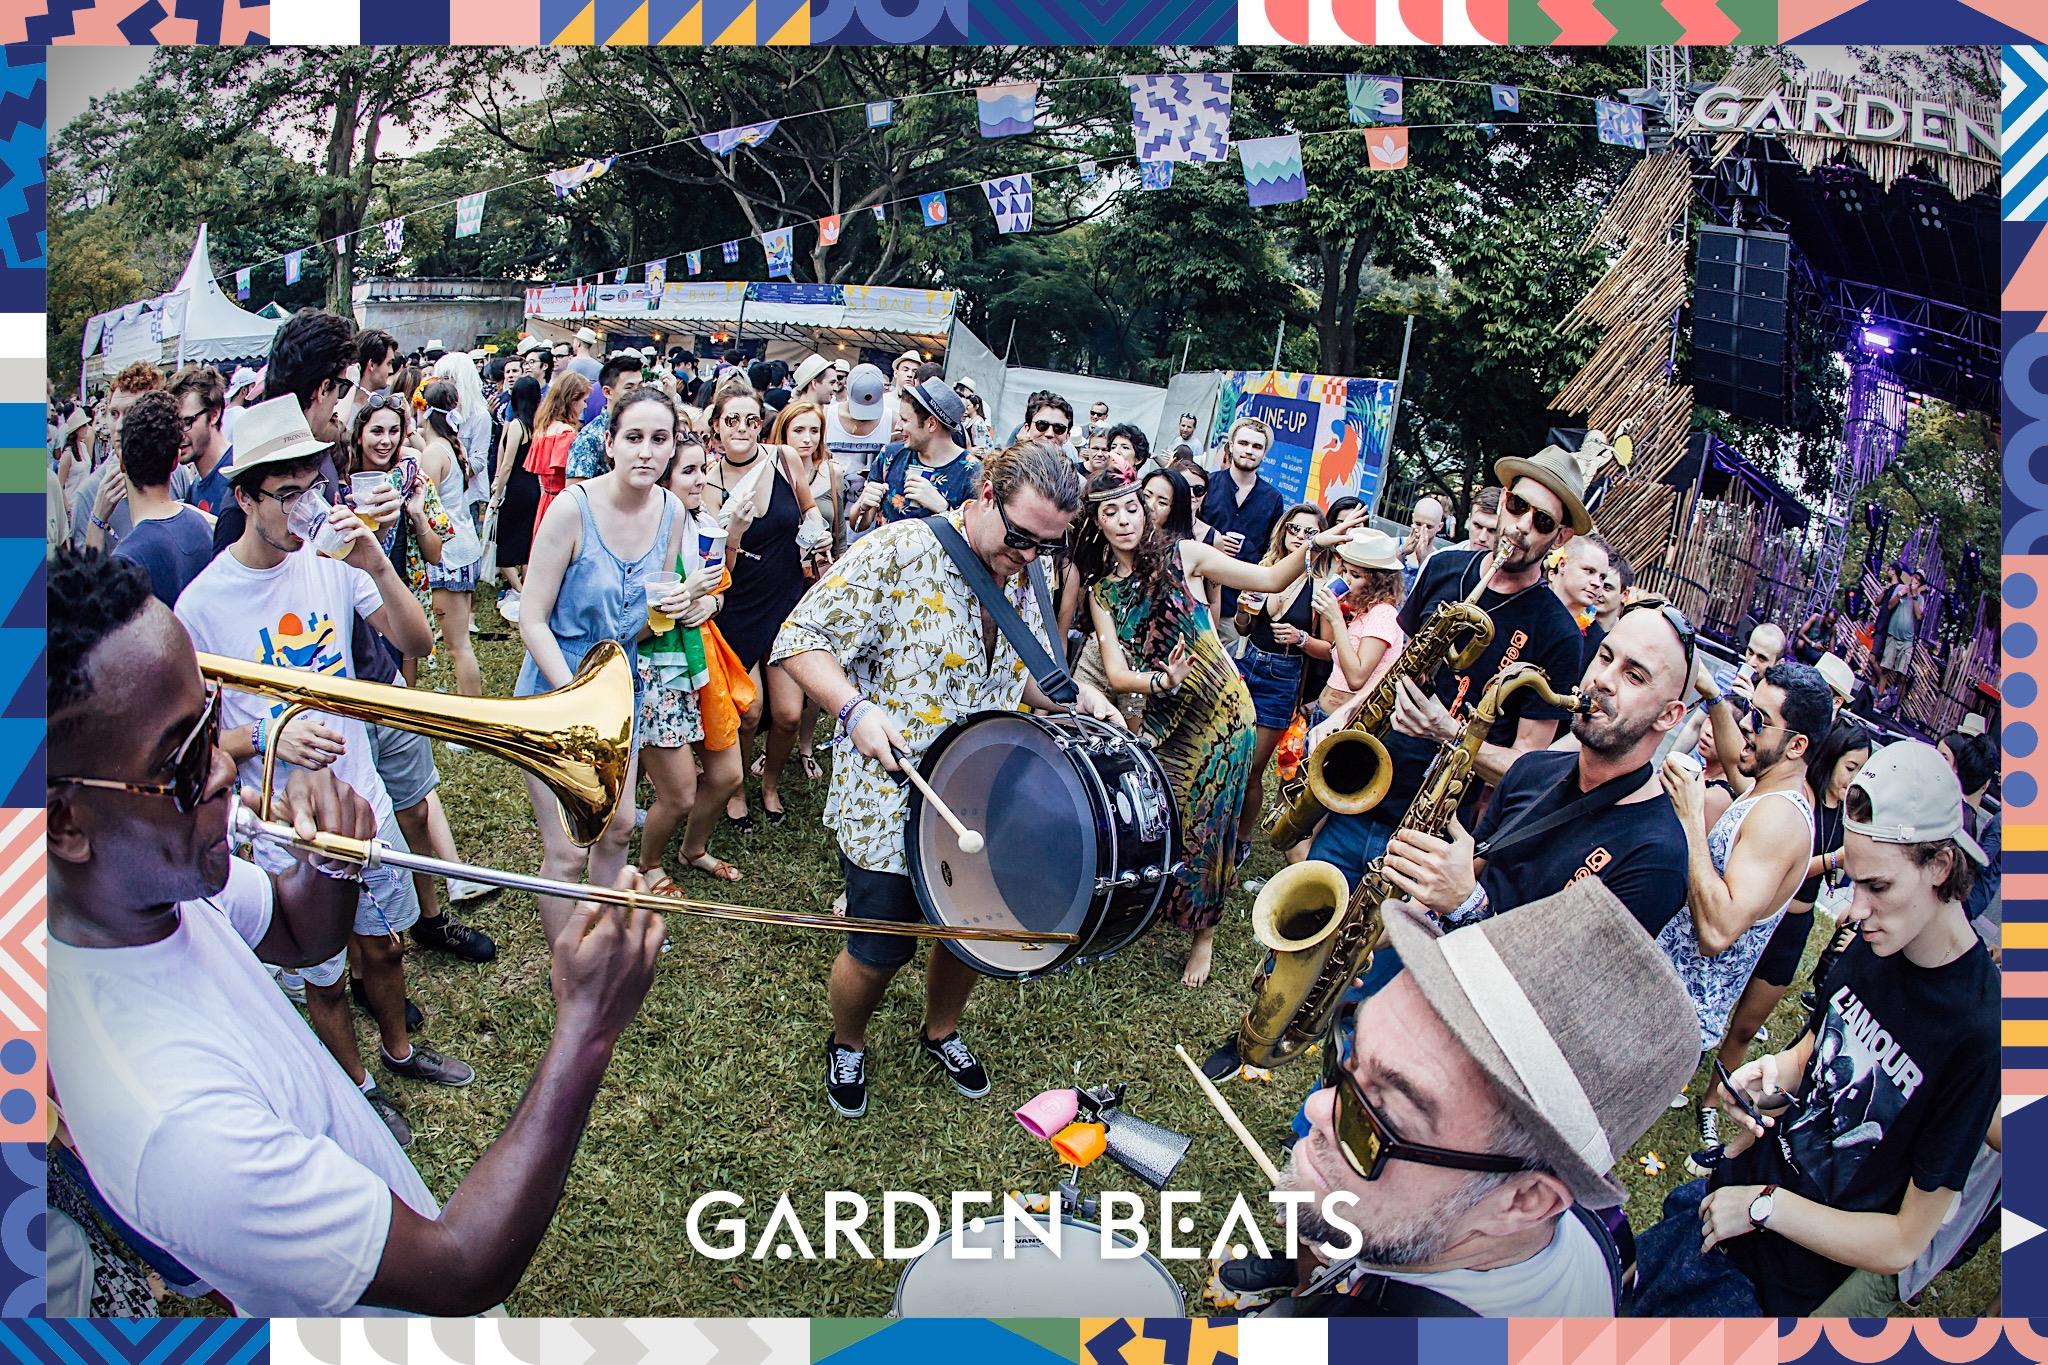 18032017_GardenBeats_Colossal622_WatermarkedGB.jpg